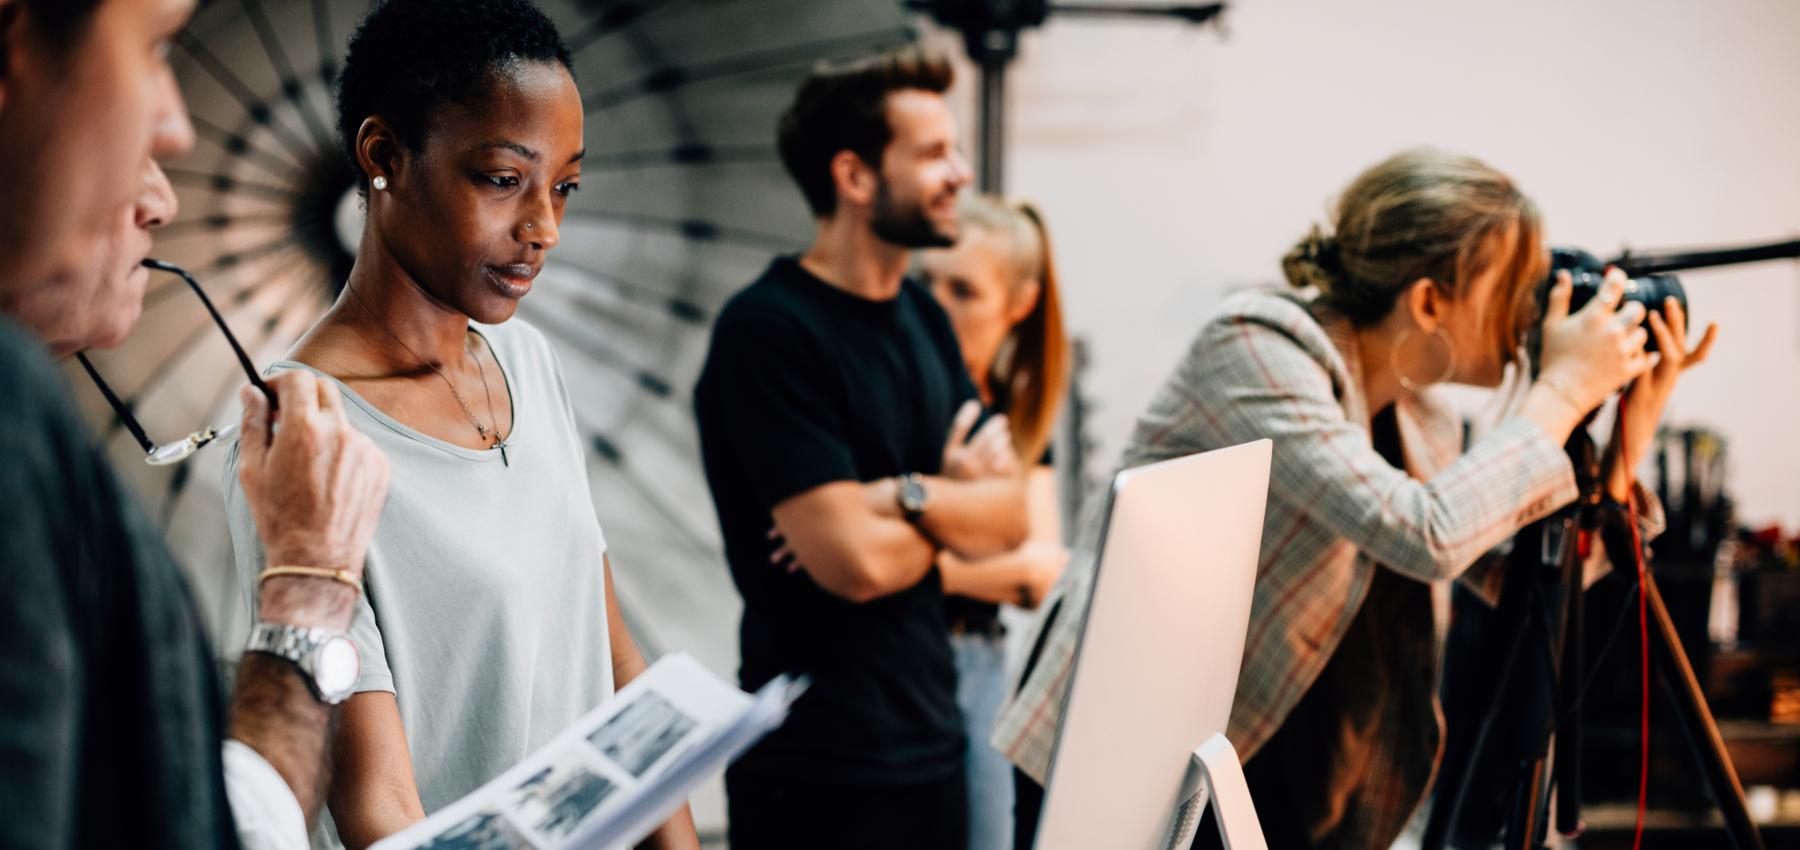 Canada job market analysis: Creative Arts and Design